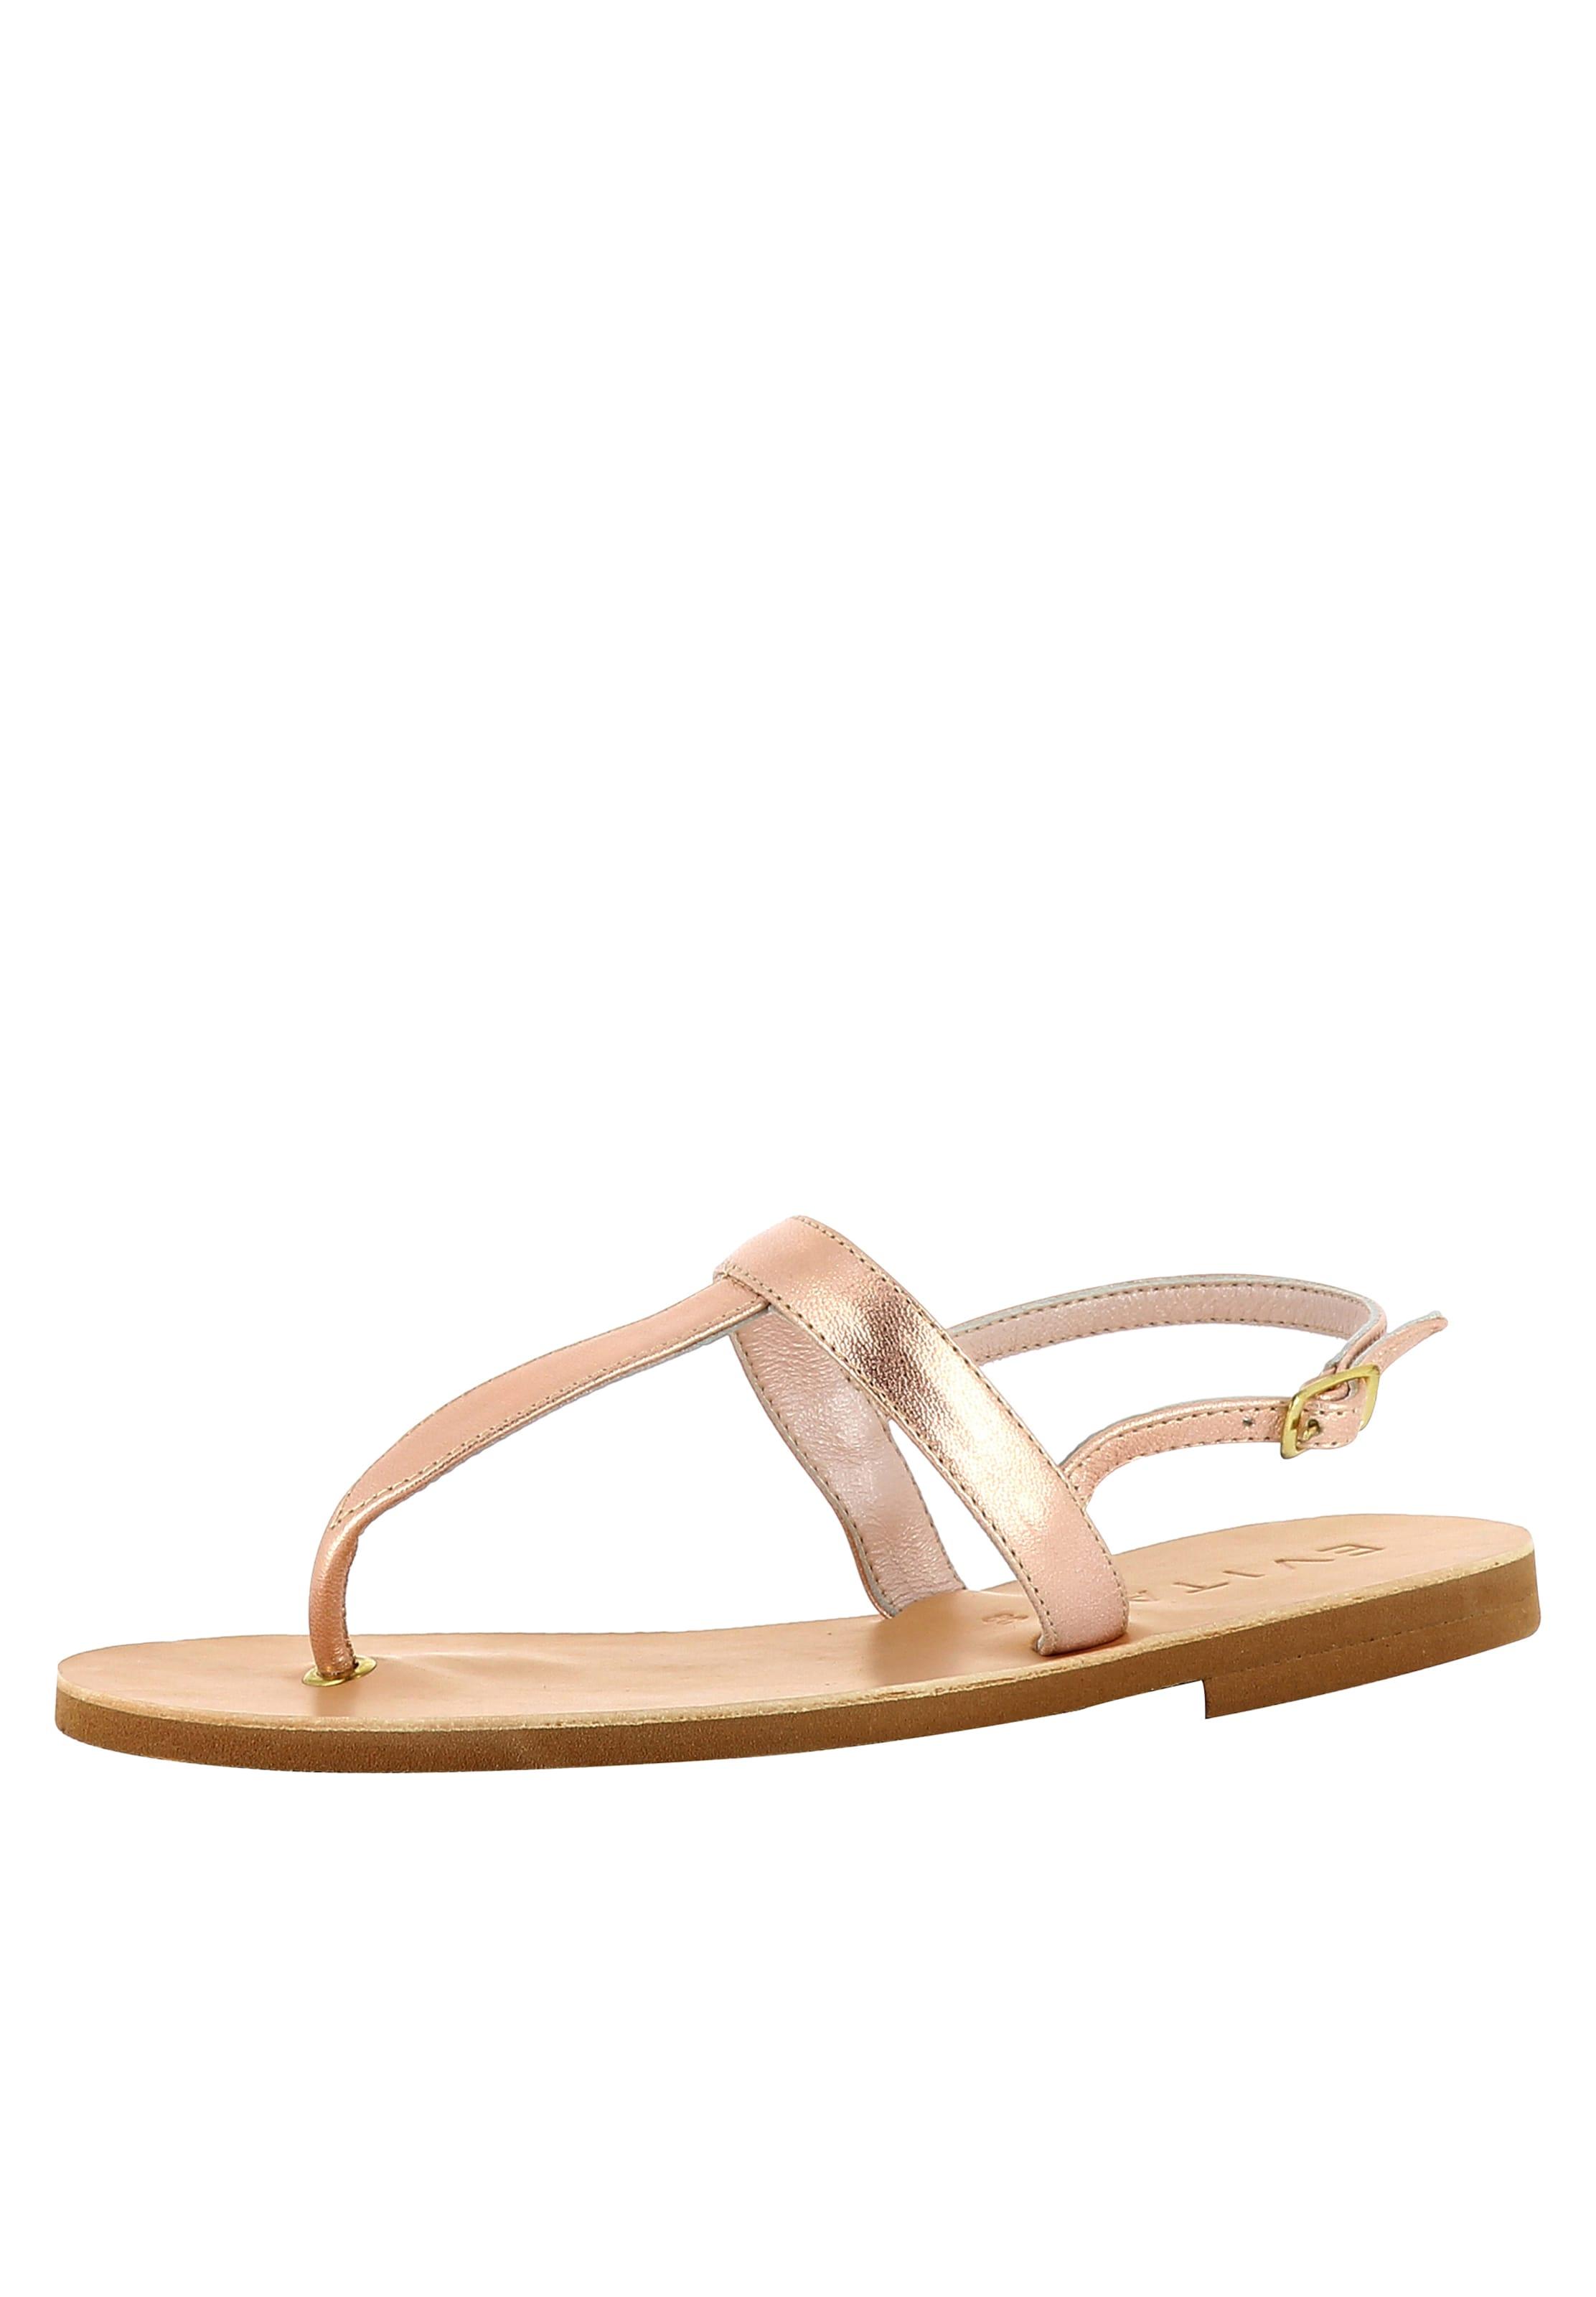 EVITA Damen Sandale Verschleißfeste billige Schuhe